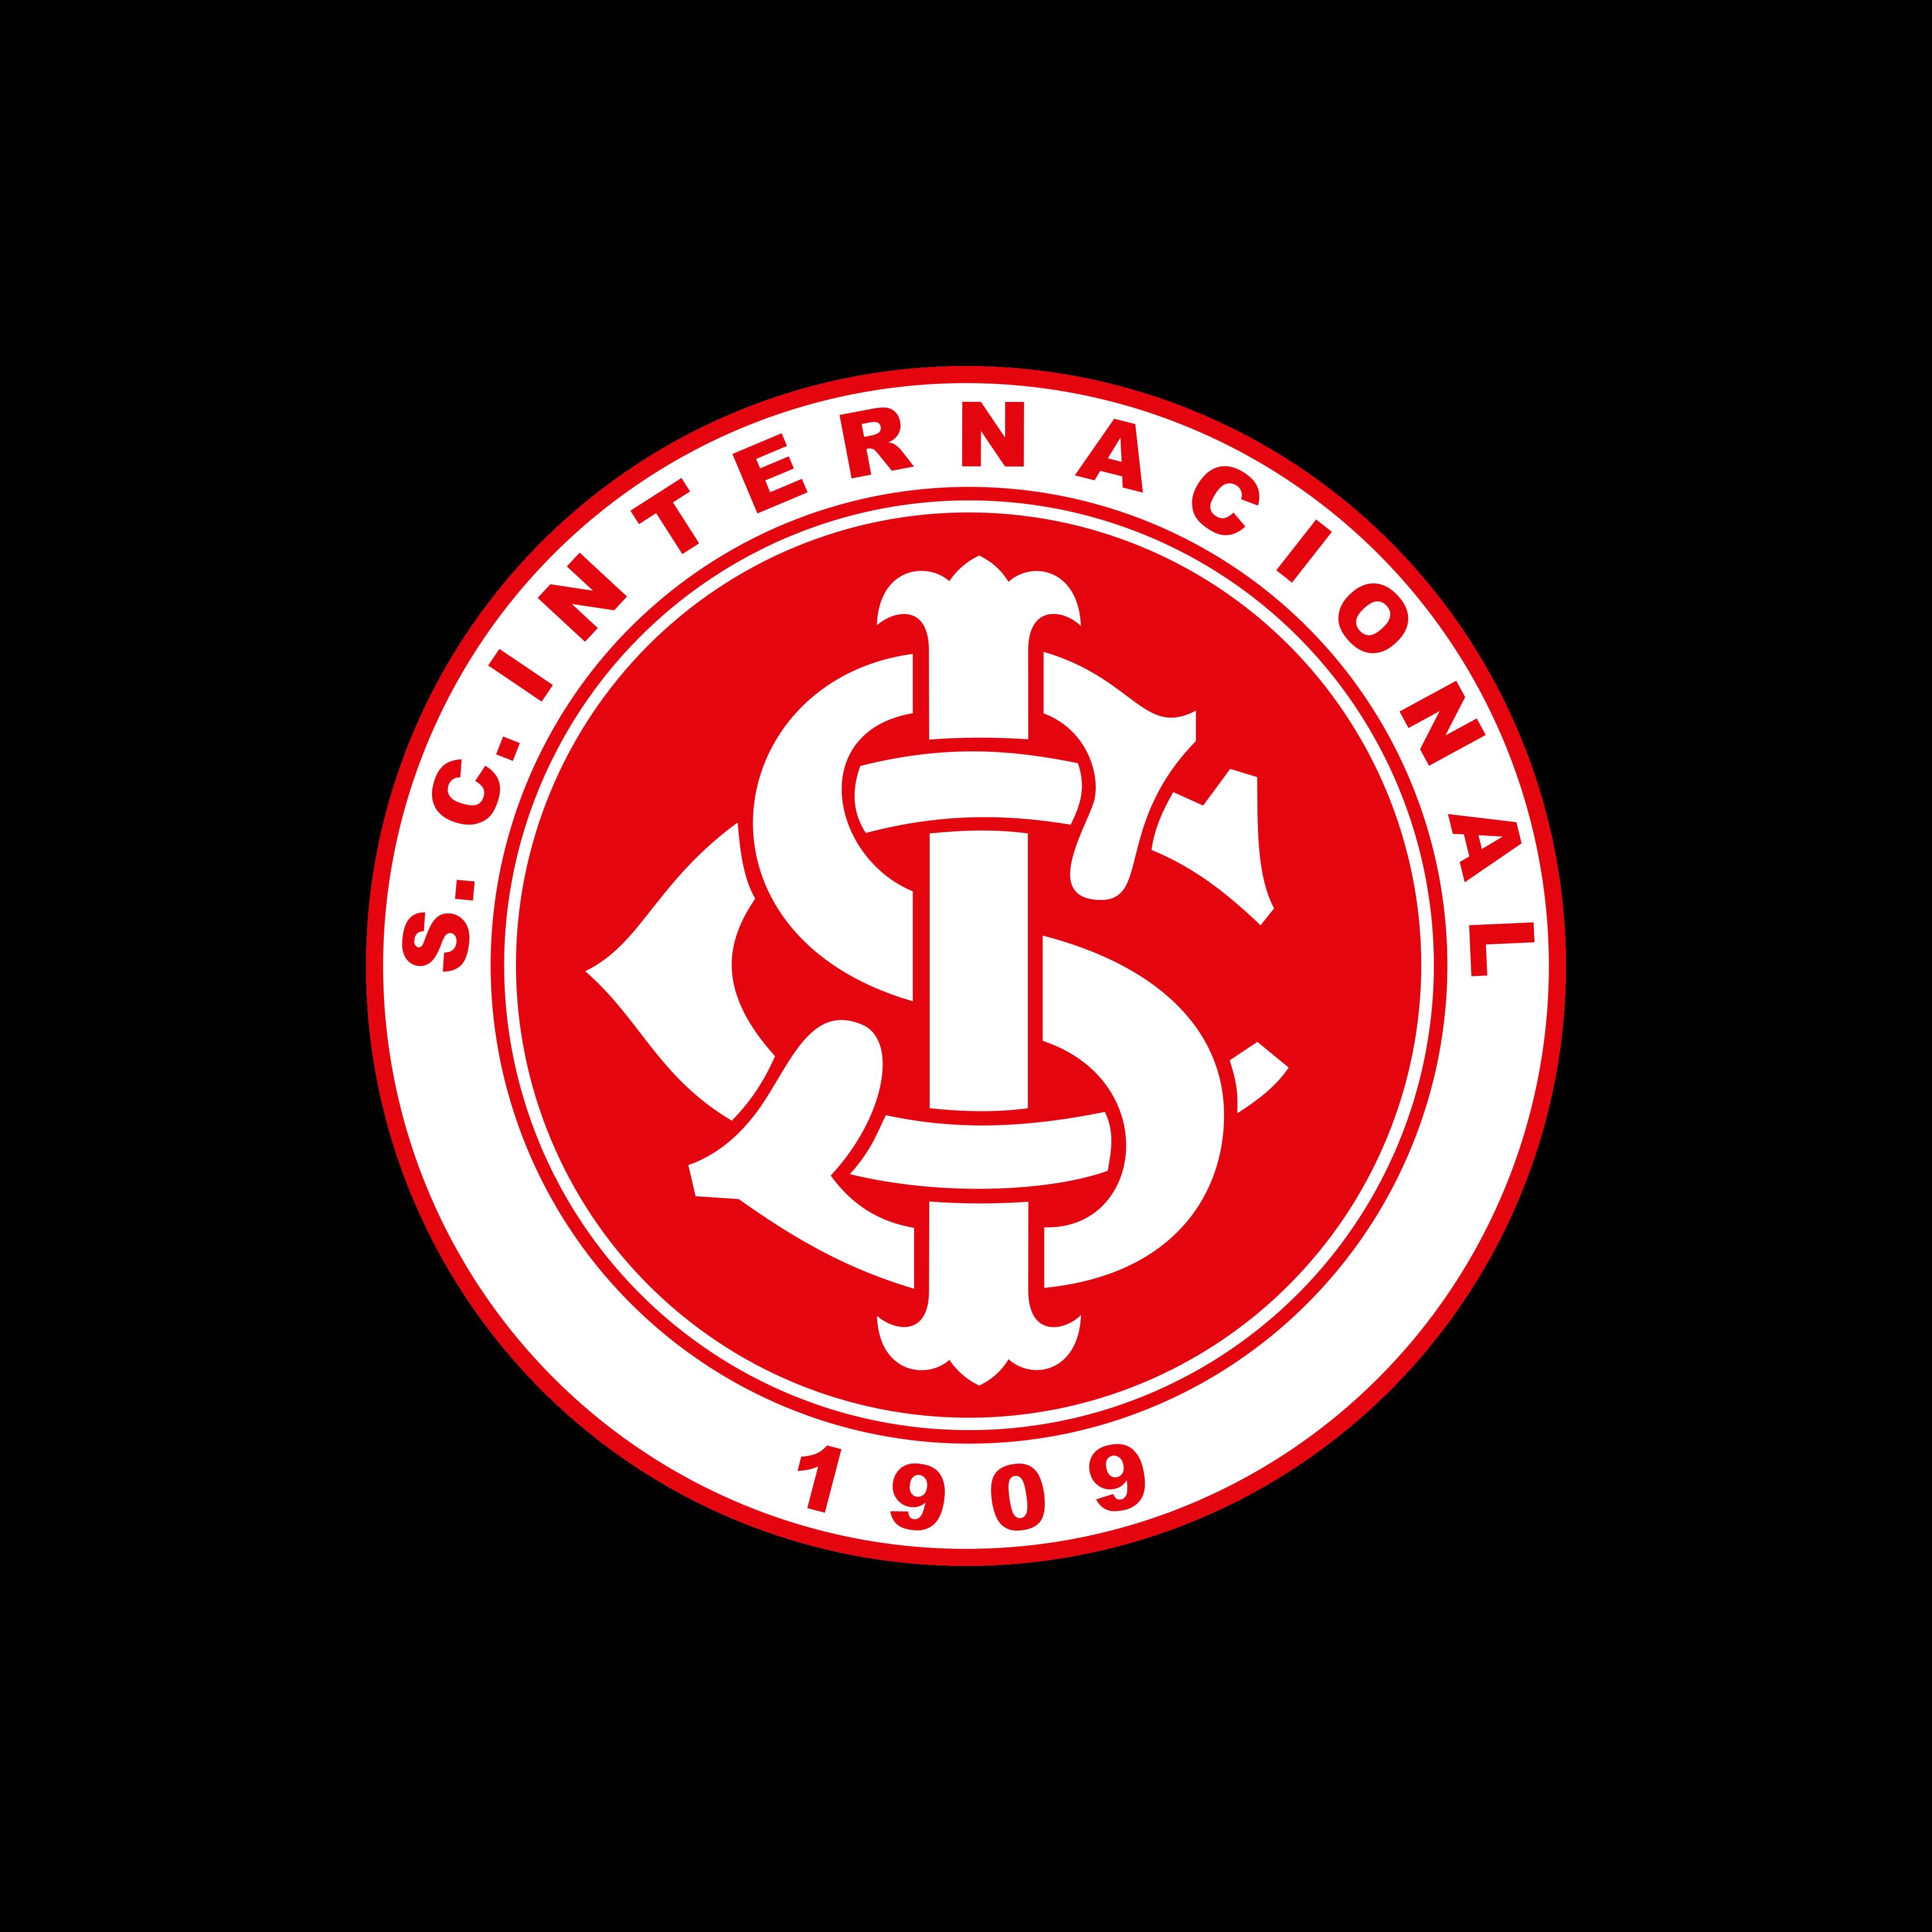 internacional logo 0 - Internacional Logo - Sport Club Internacional de Brasil Escudo